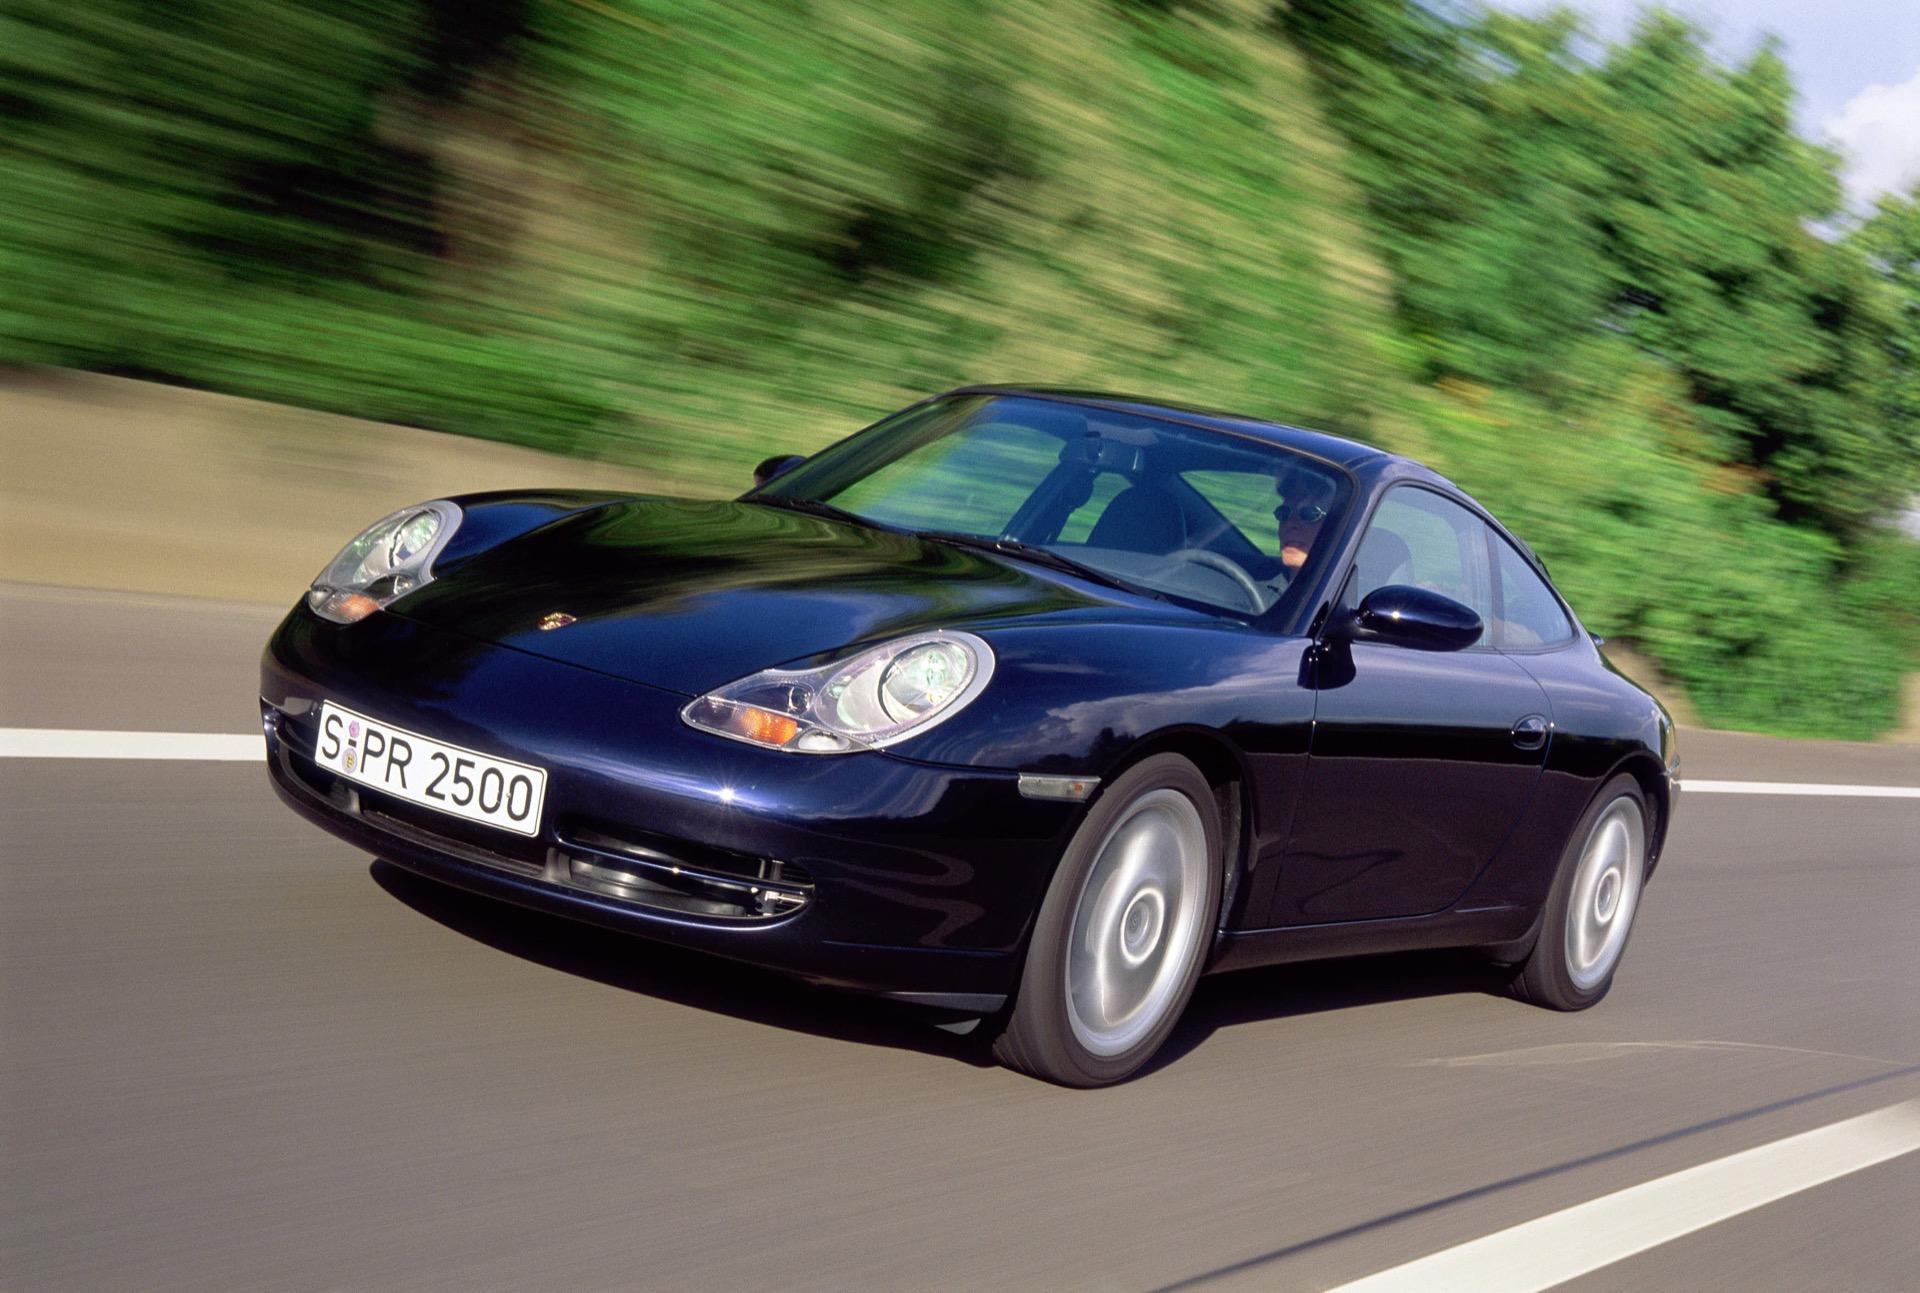 2001, 911 Carrera Coupé, Typ 996, 3,4 Liter, Generationen